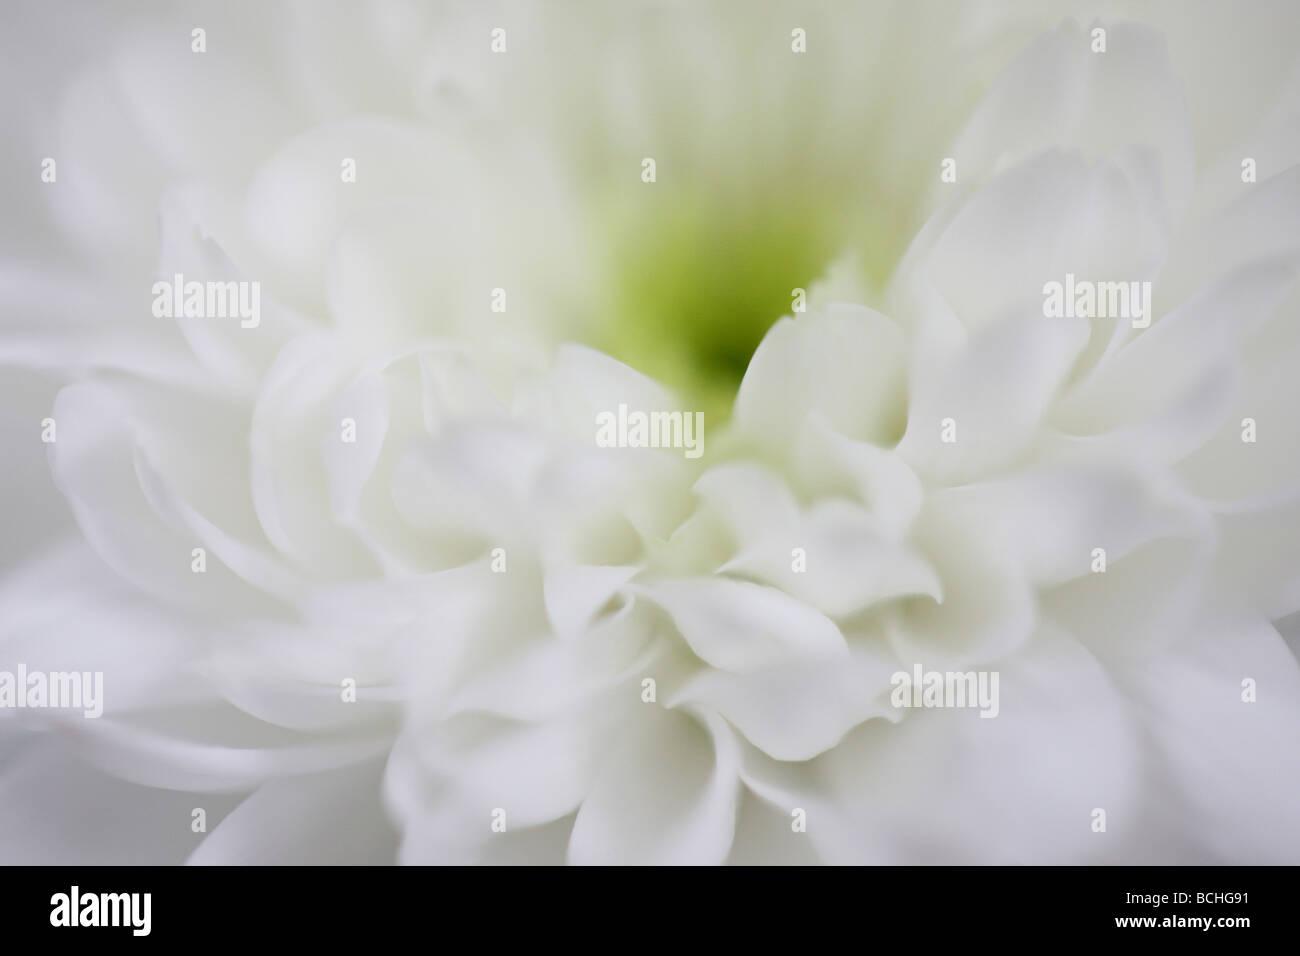 Chrysanthème blanc féminin fine art photography Photographie Jane Ann Butler JABP414 Photo Stock